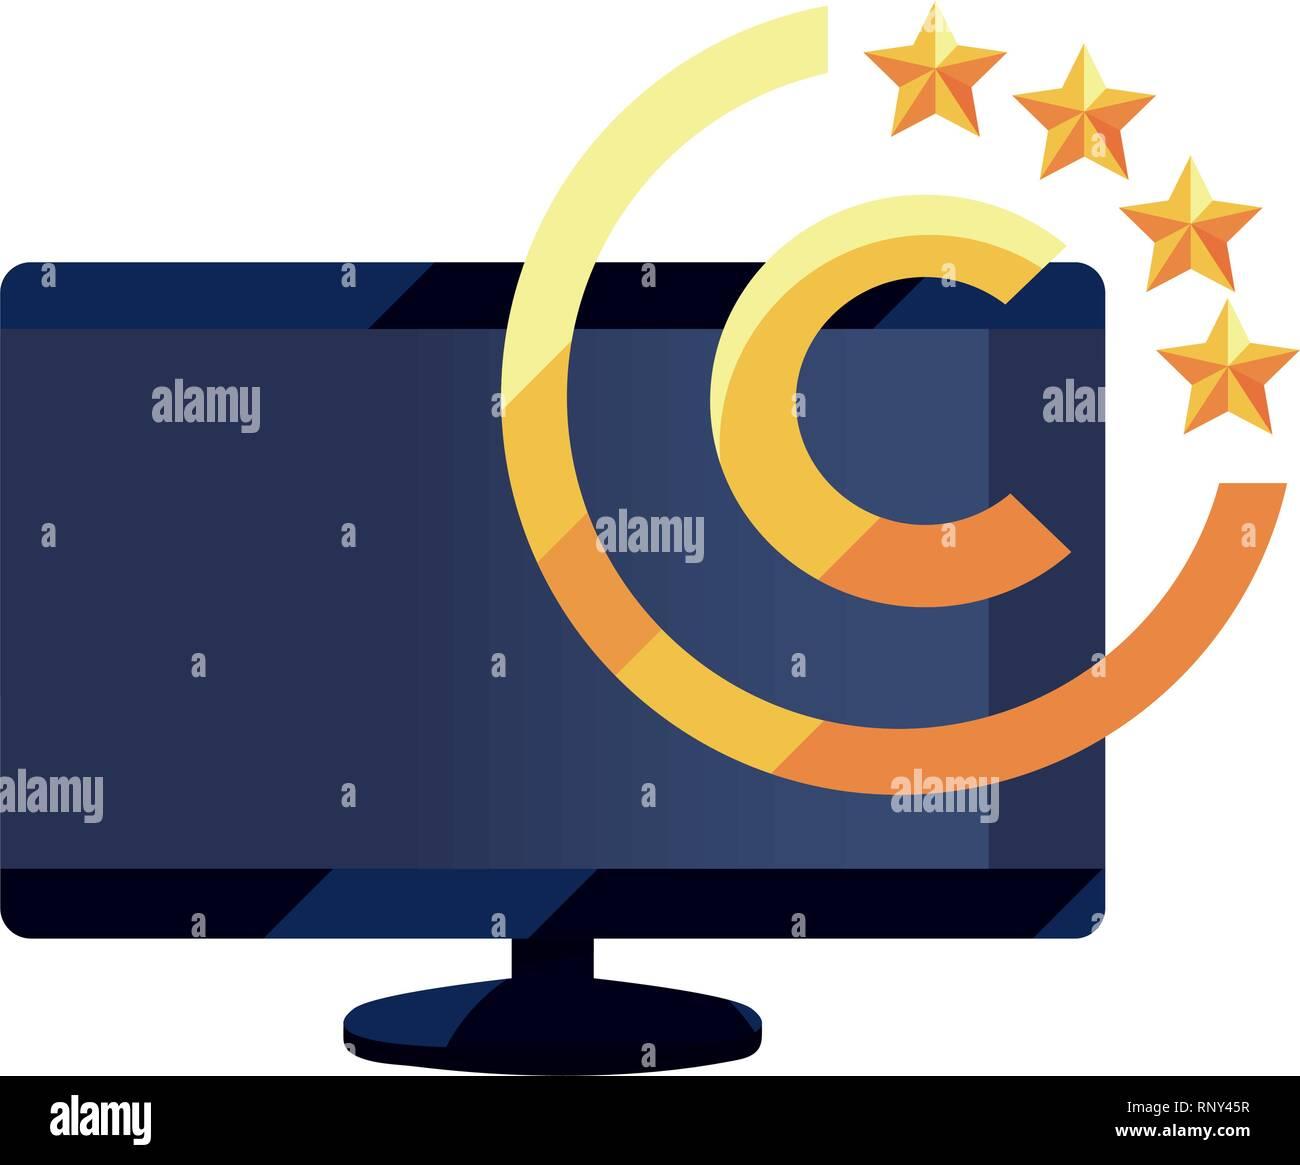 computer copyright intellectual symbol vector illustration - Stock Image